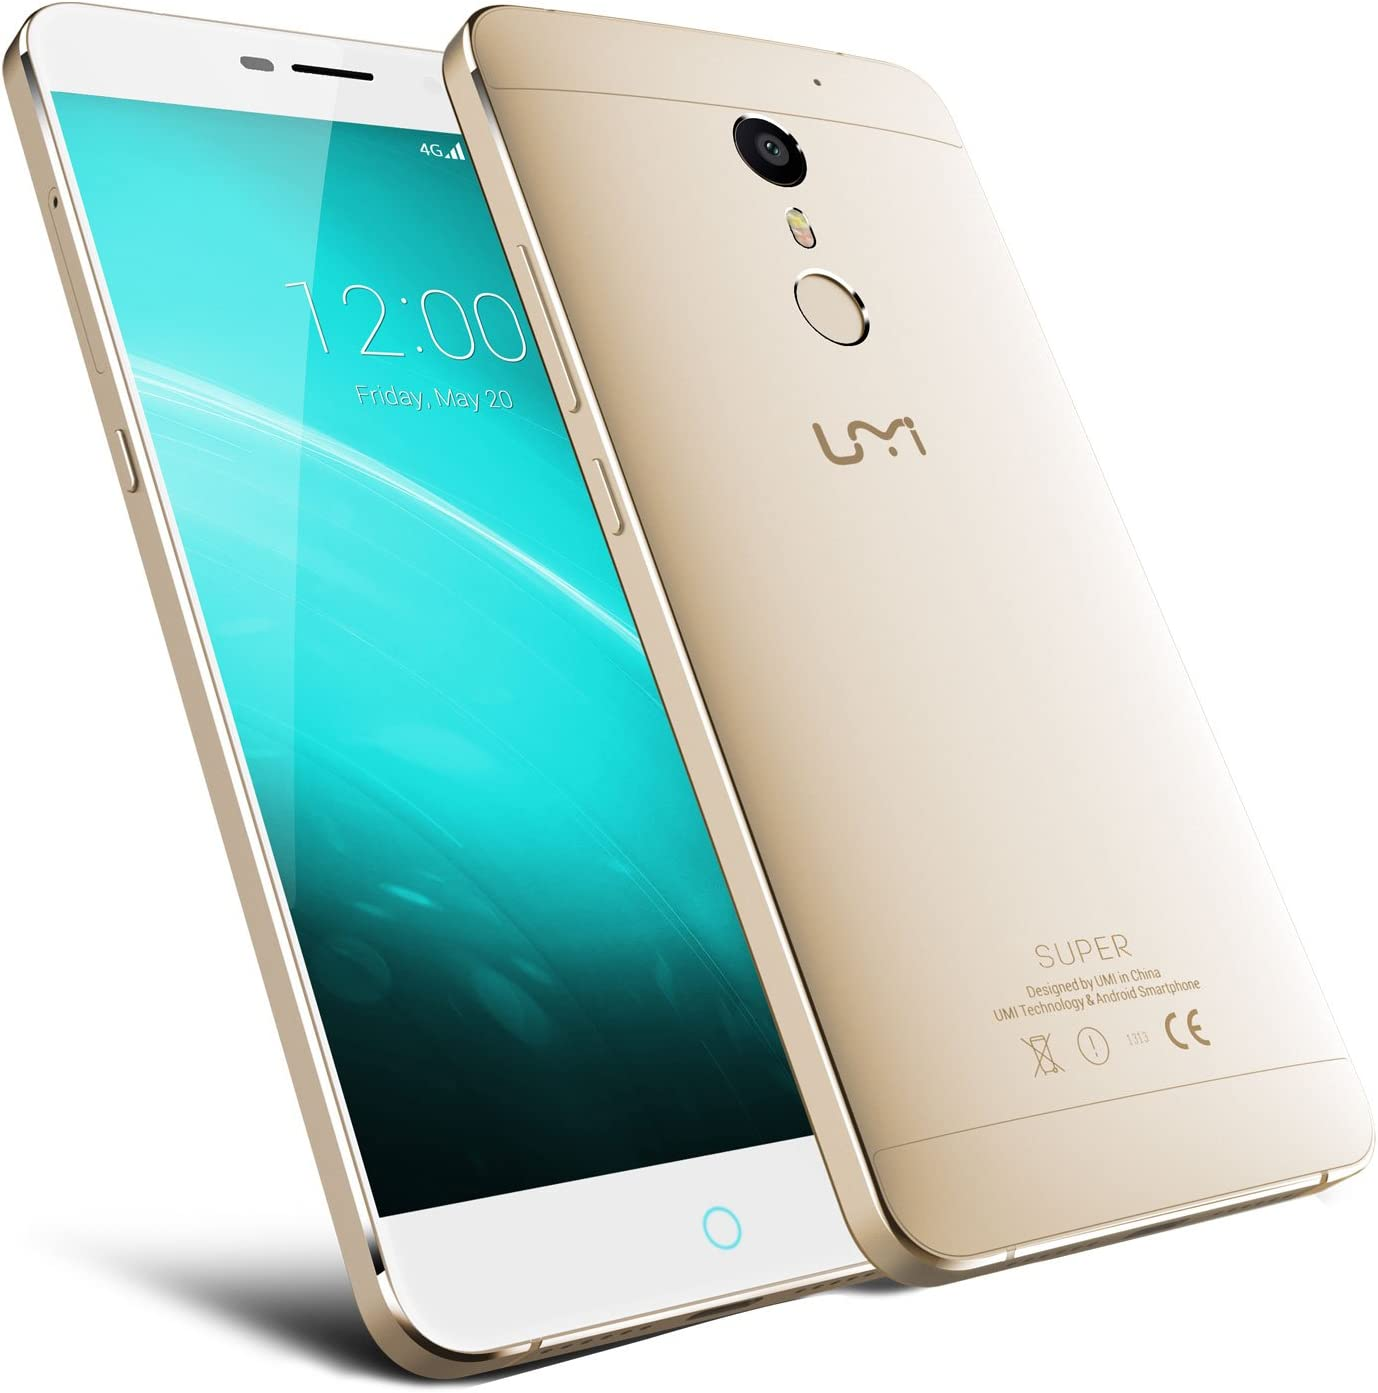 UMI Super Android 6.0 Smartphone simlockfrei Dual SIM 4000 mAh ...